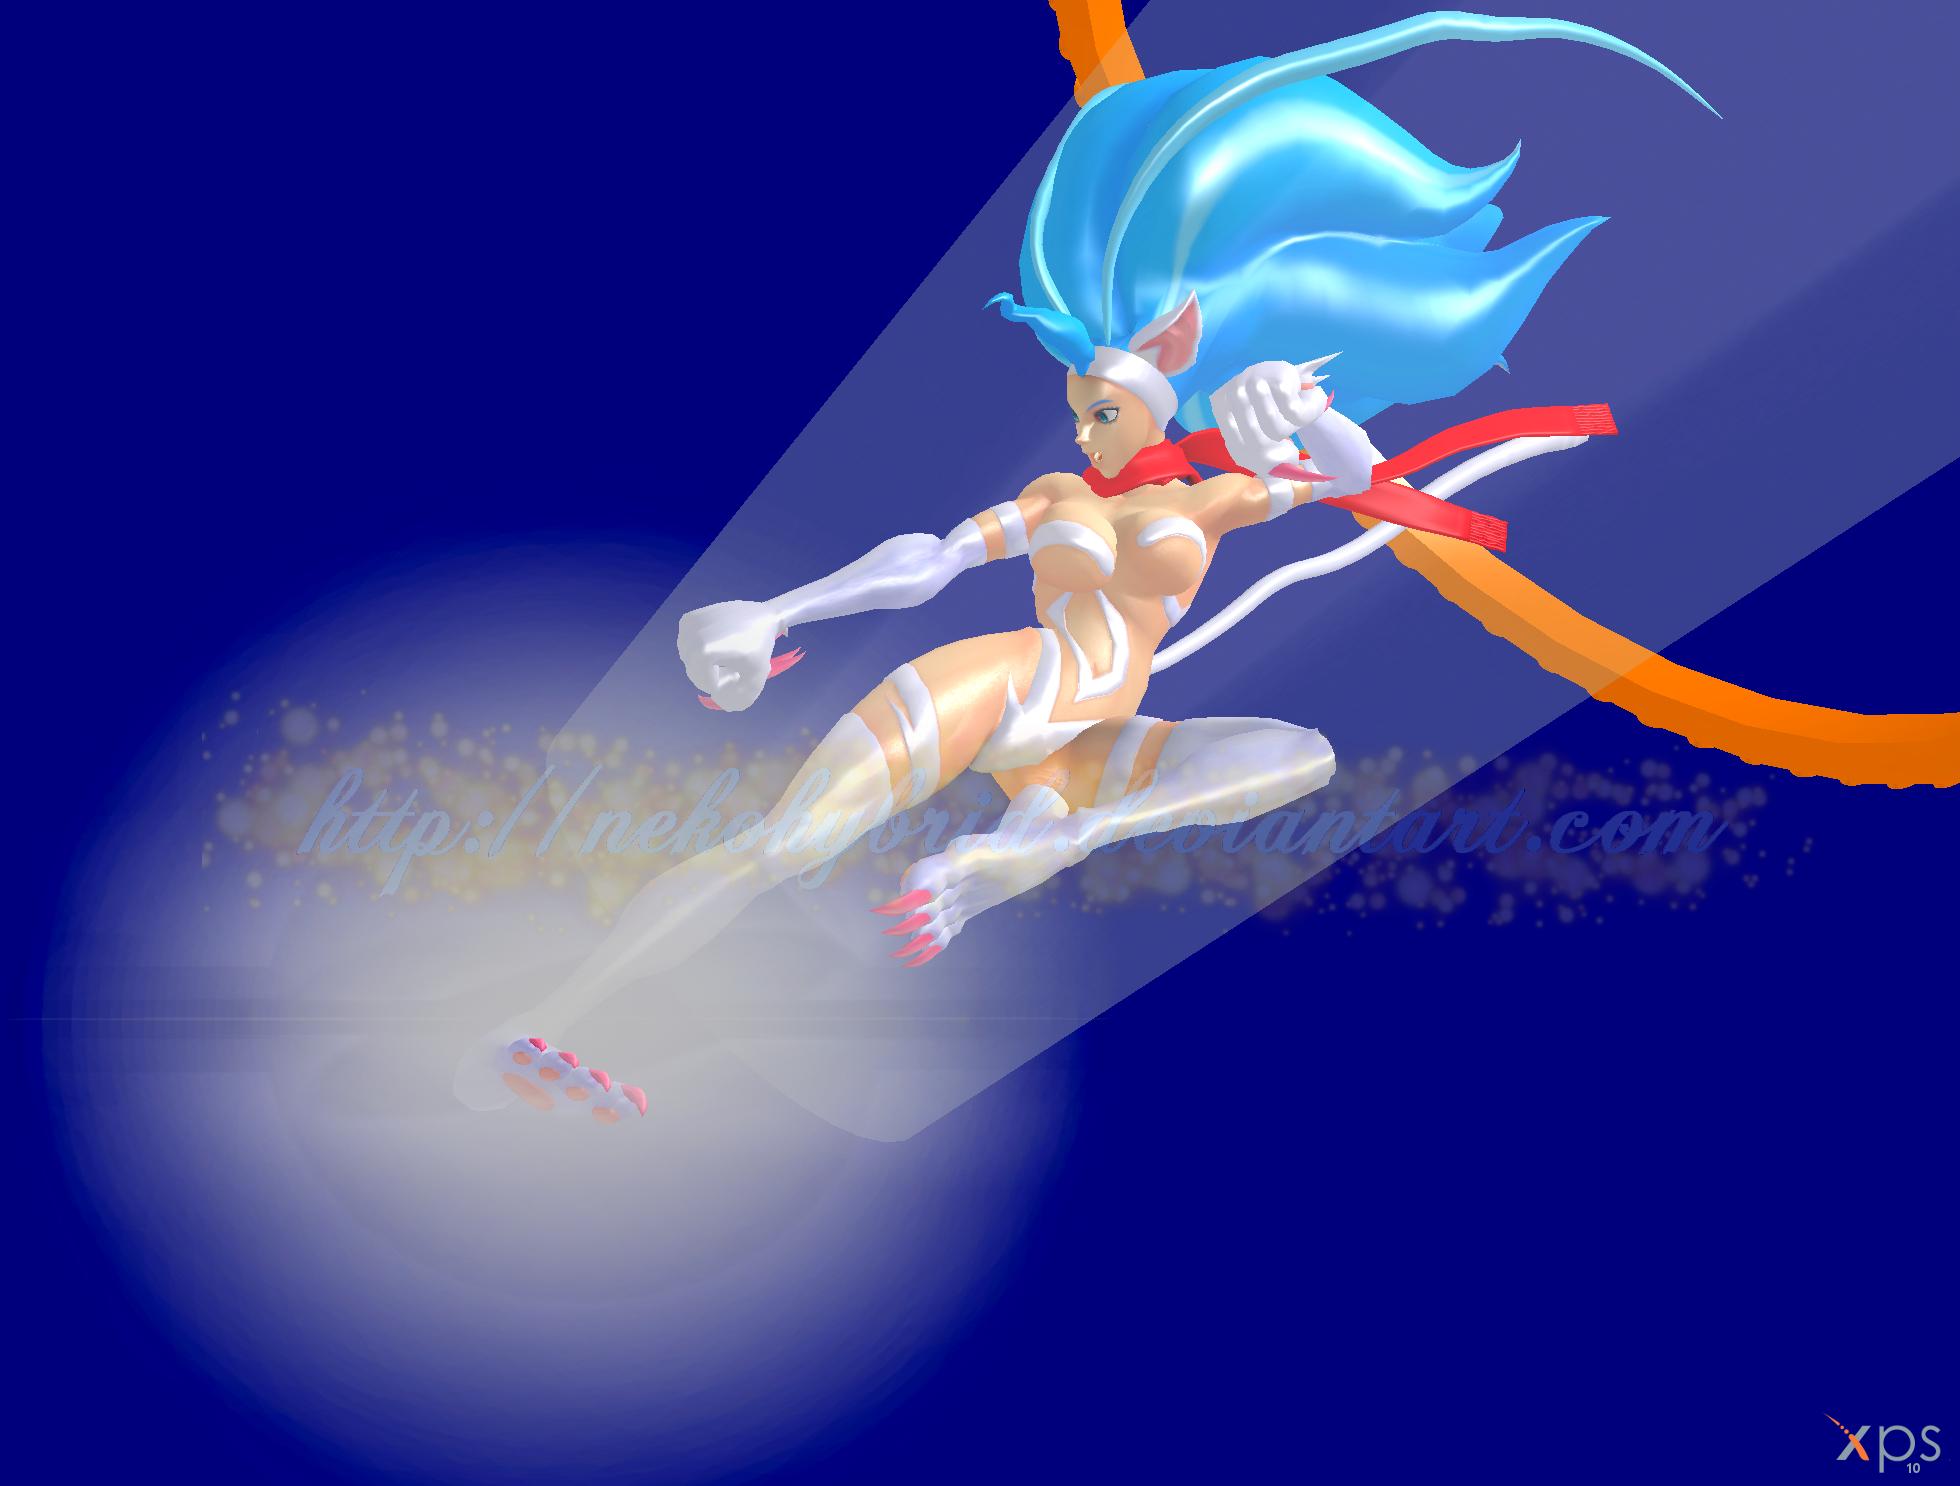 Felicia Rider Kick by NekoHybrid